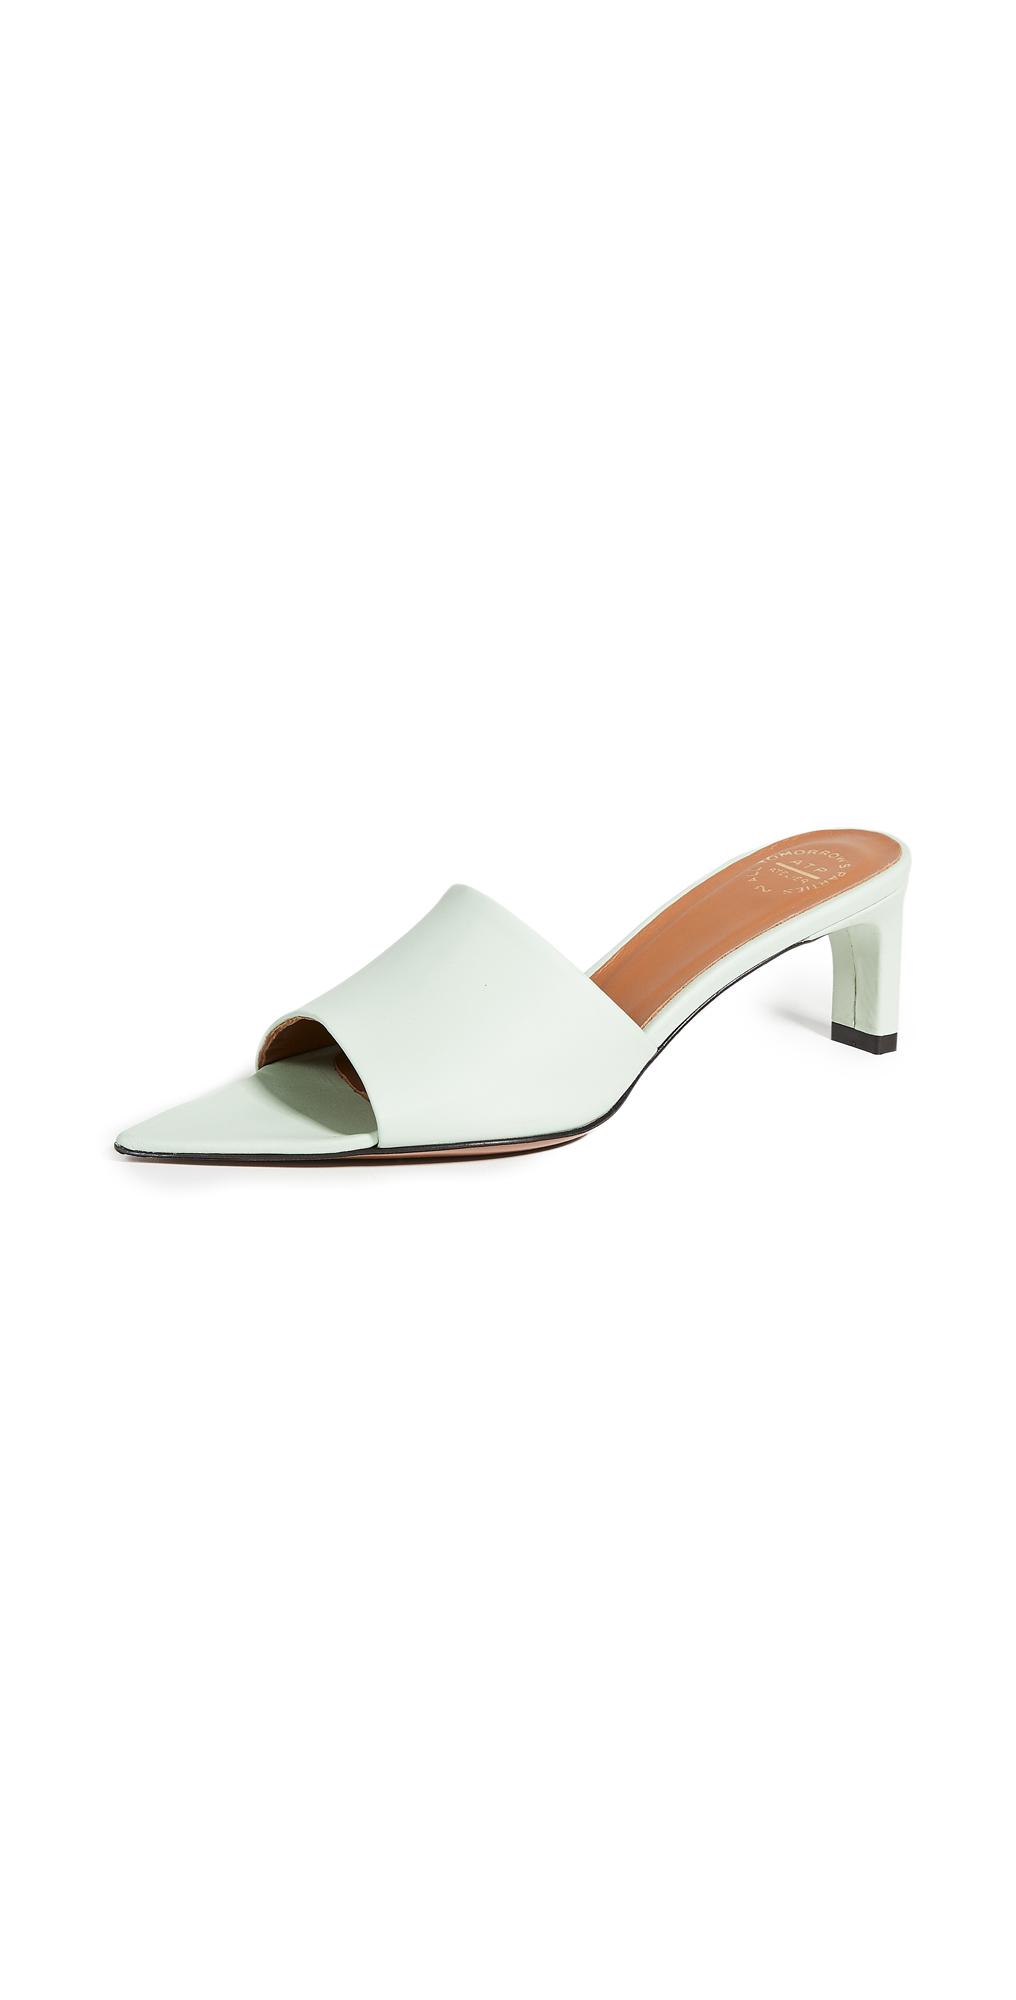 ATP Atelier Serranova Mule Sandals